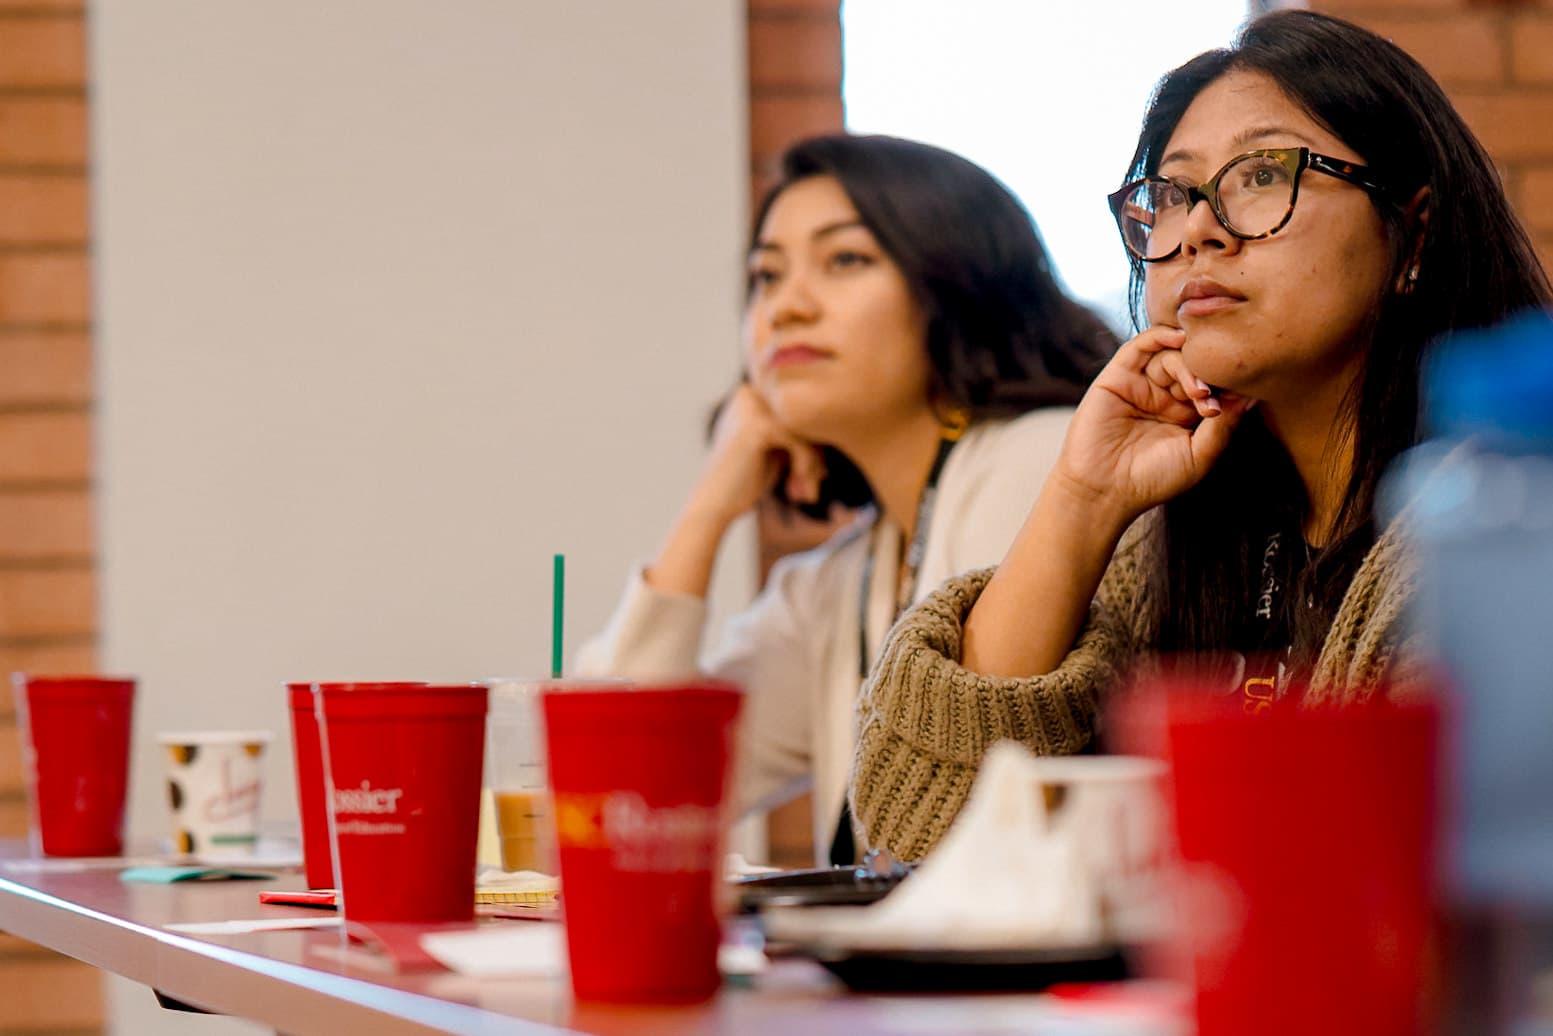 USC Rossier教育学院在2021年U.S. News美国大学排名中跻身顶尖研究生院之列-南加州大学中文官网